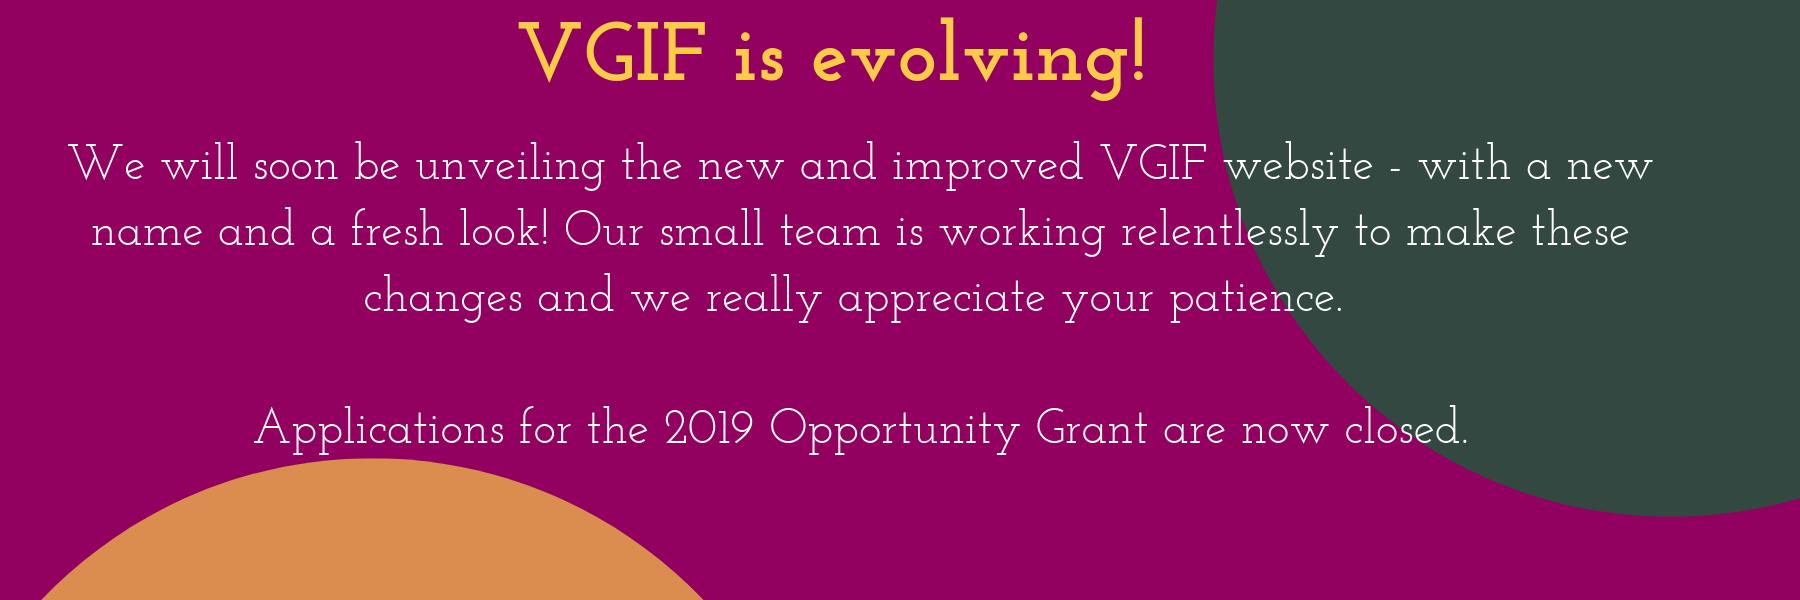 VGIF is evloving! (1).png